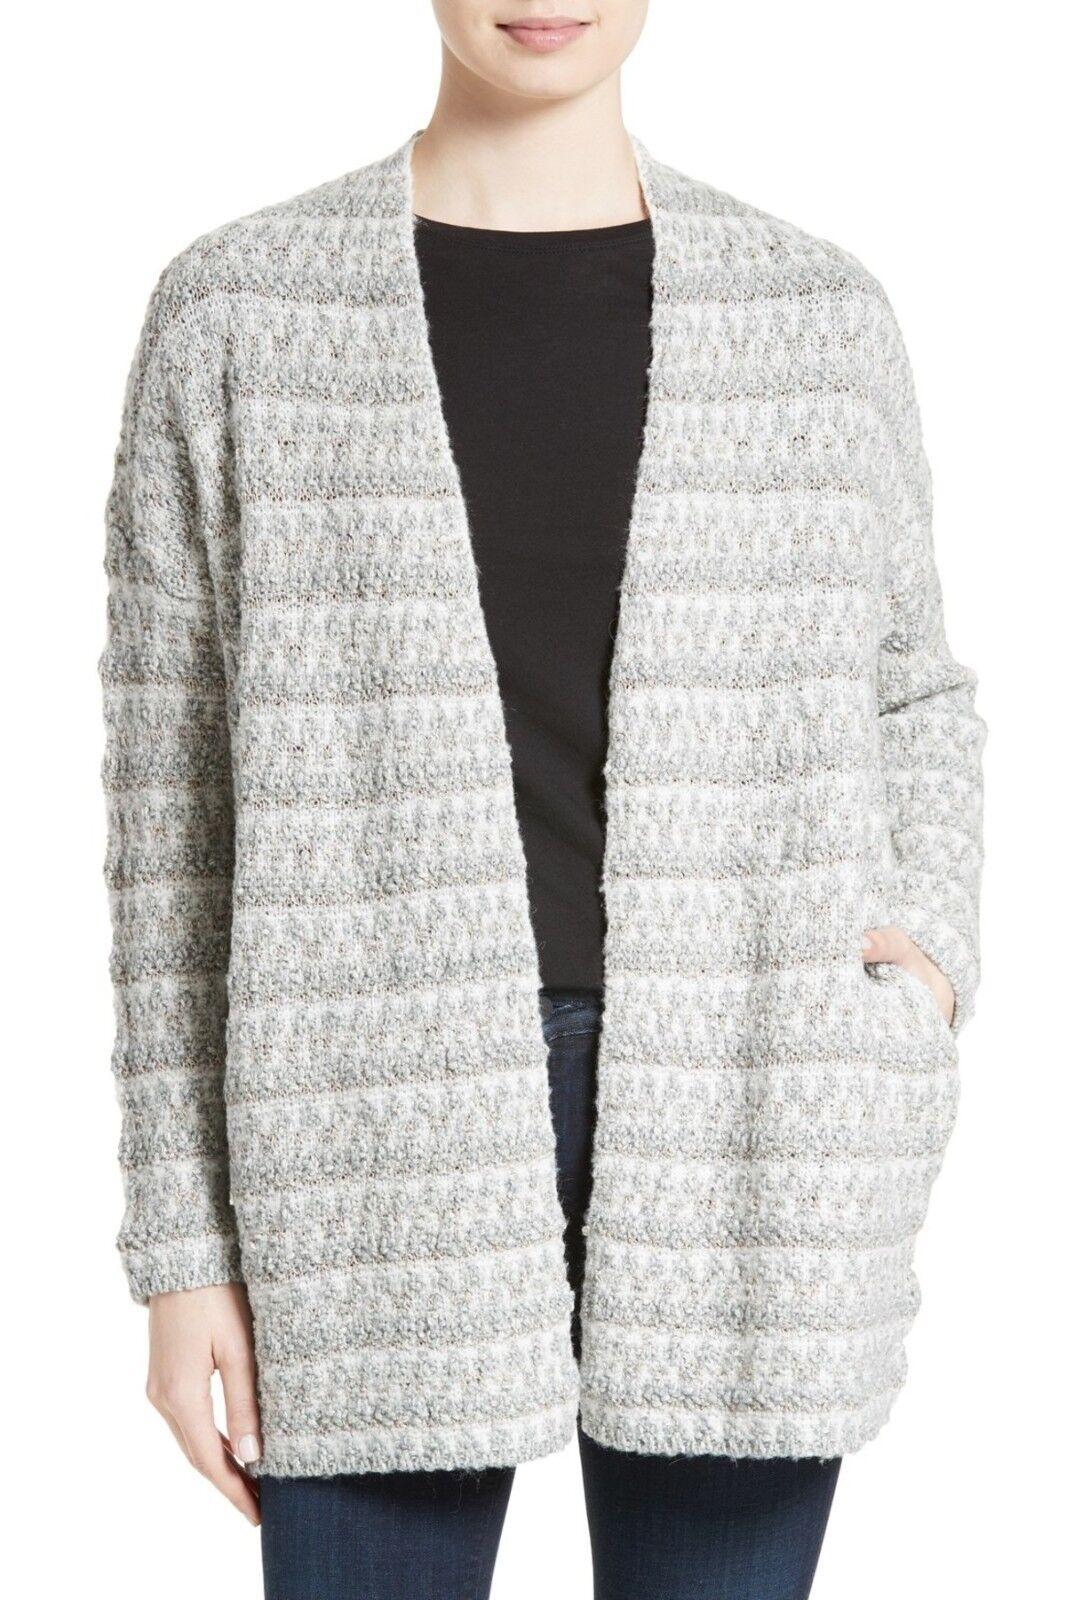 NWT- Joie Lerado Boucle Cardigan Sweater, Porcelain Antique Silber - Größe Medium